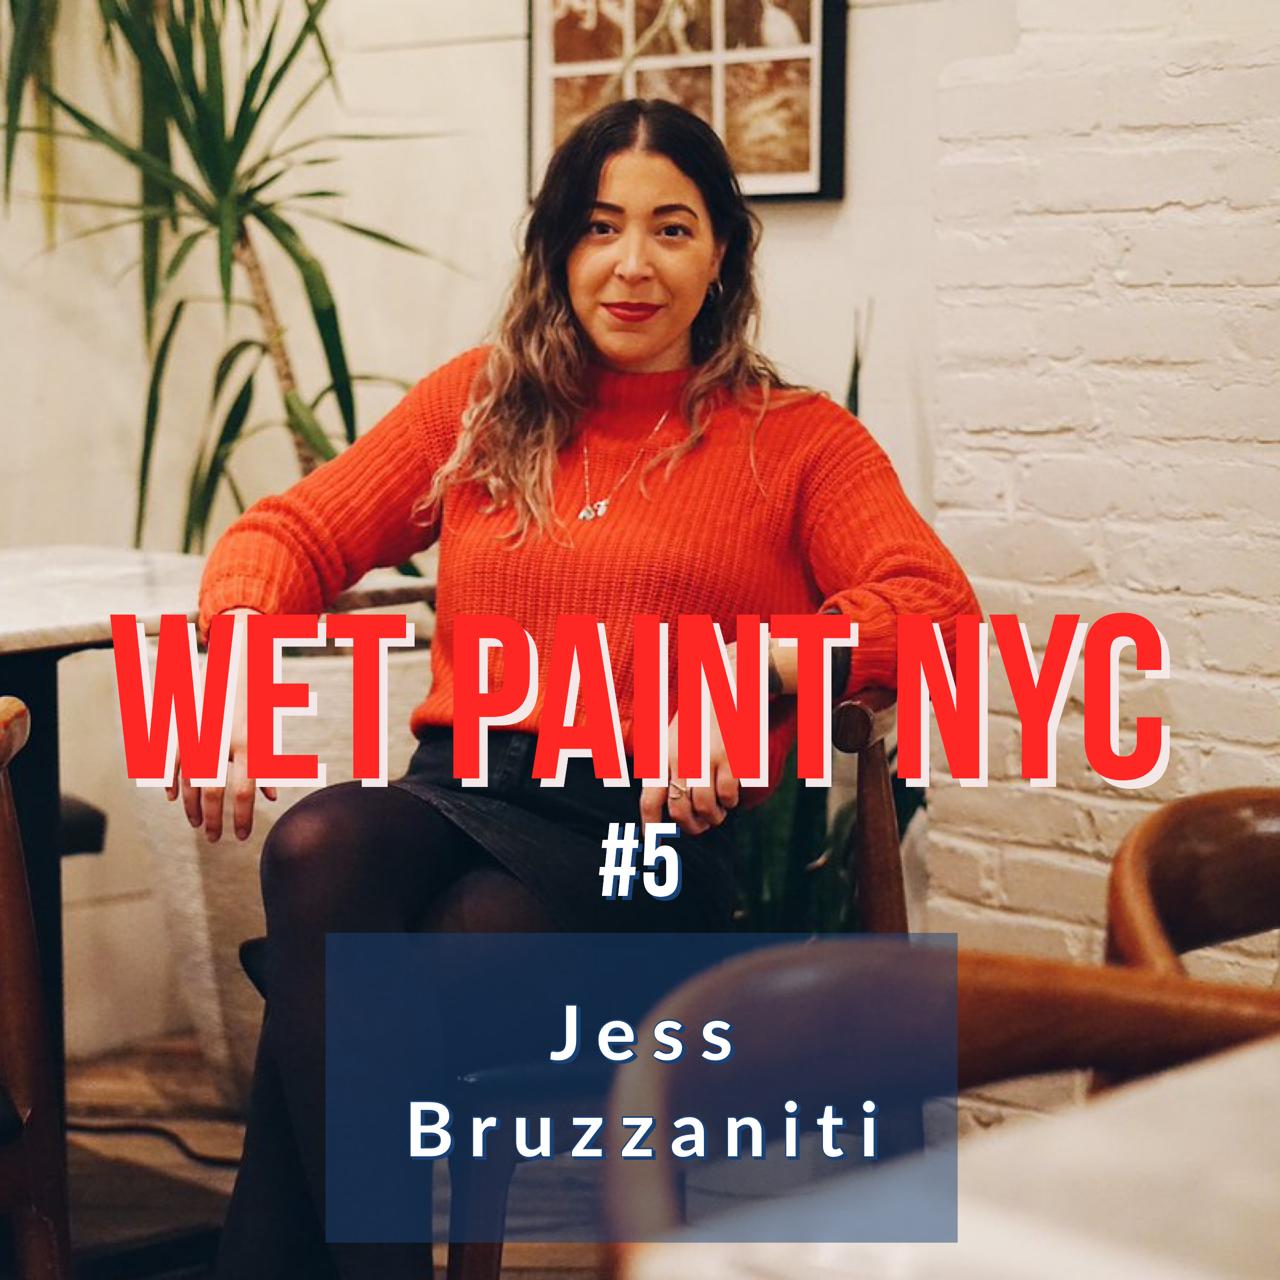 Artist and art advisor Jess Bruzzaniti chats about light art, moving from Australia, what art advisors do and more.